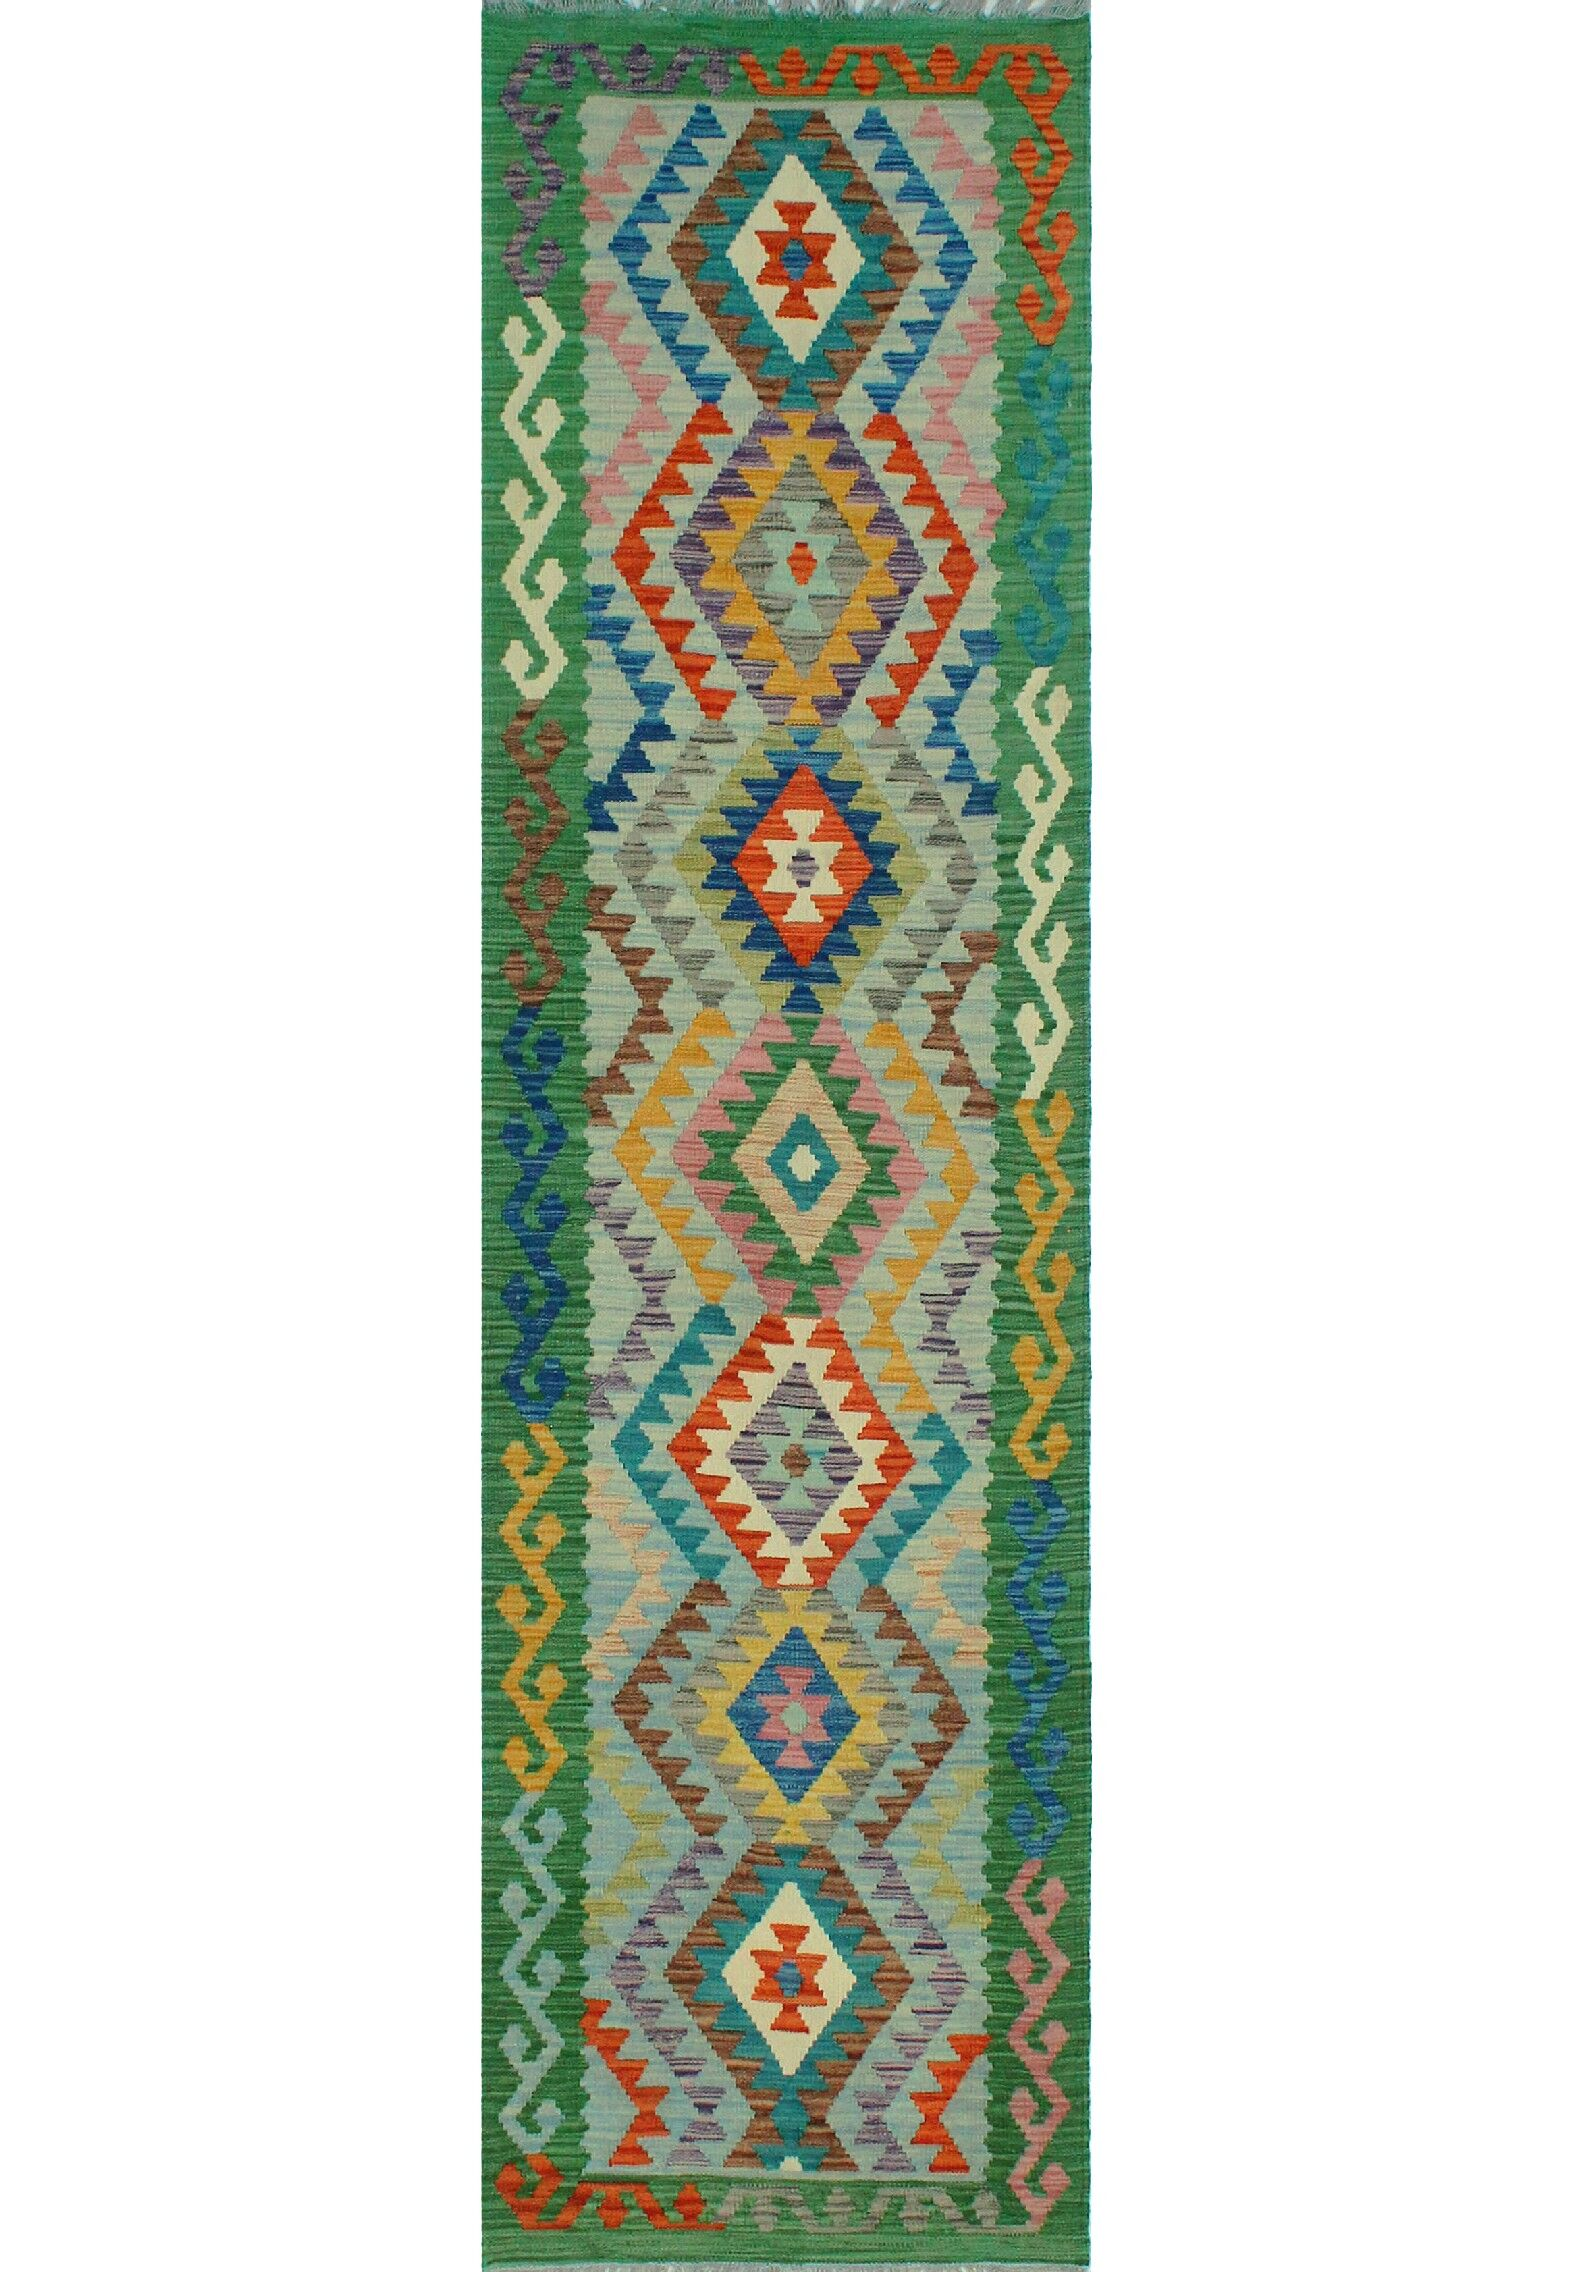 Corda Hand-Knotted Wool Green/Orange Area Rug